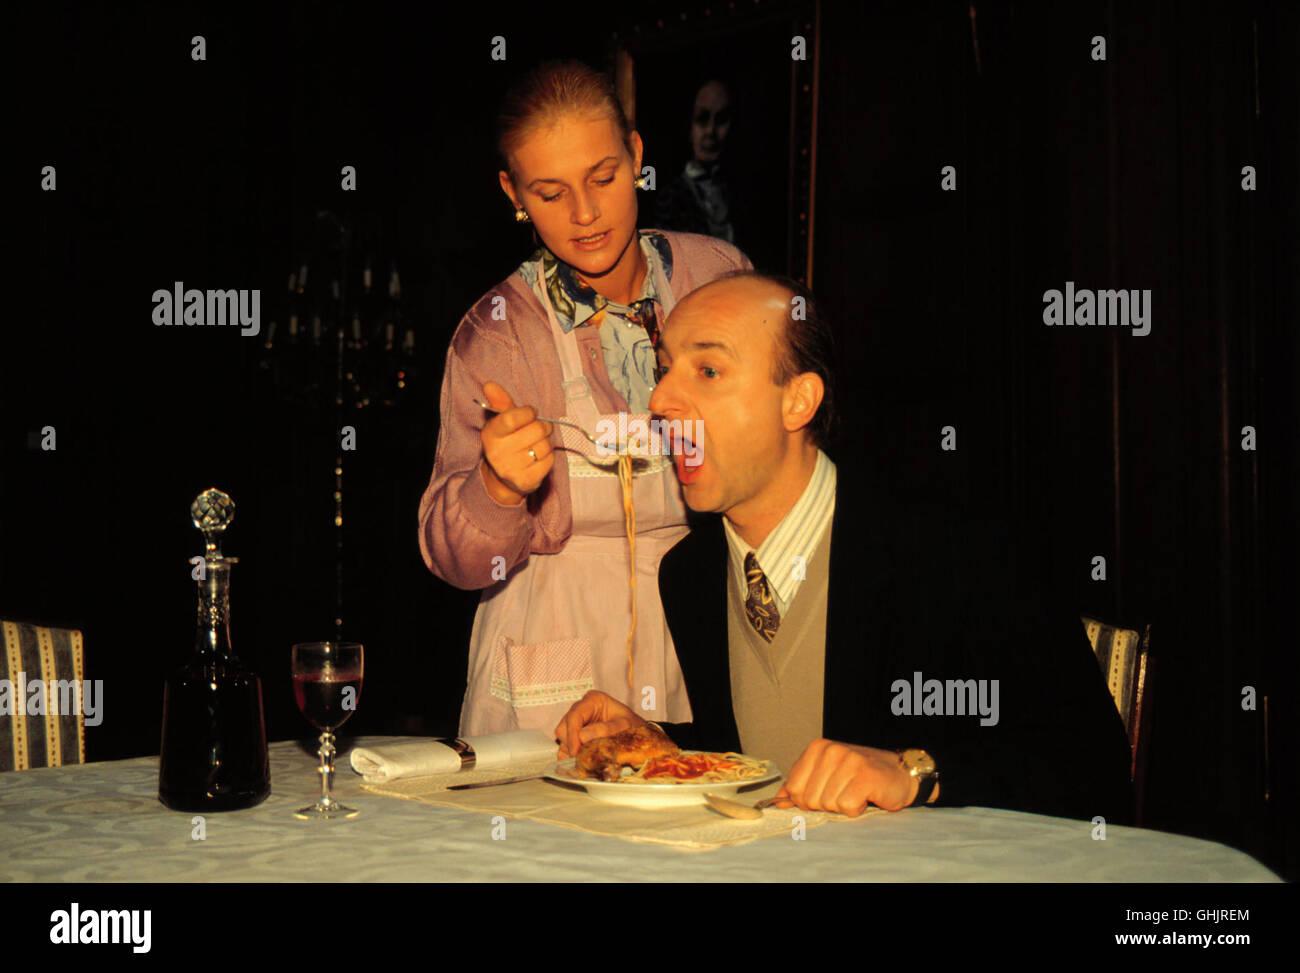 Veronika (PETRA KLEINERT) kann es nicht mehr hören, daß Joachims (MICHAEL SCHÖNBORN) Mutter immer - Stock Image